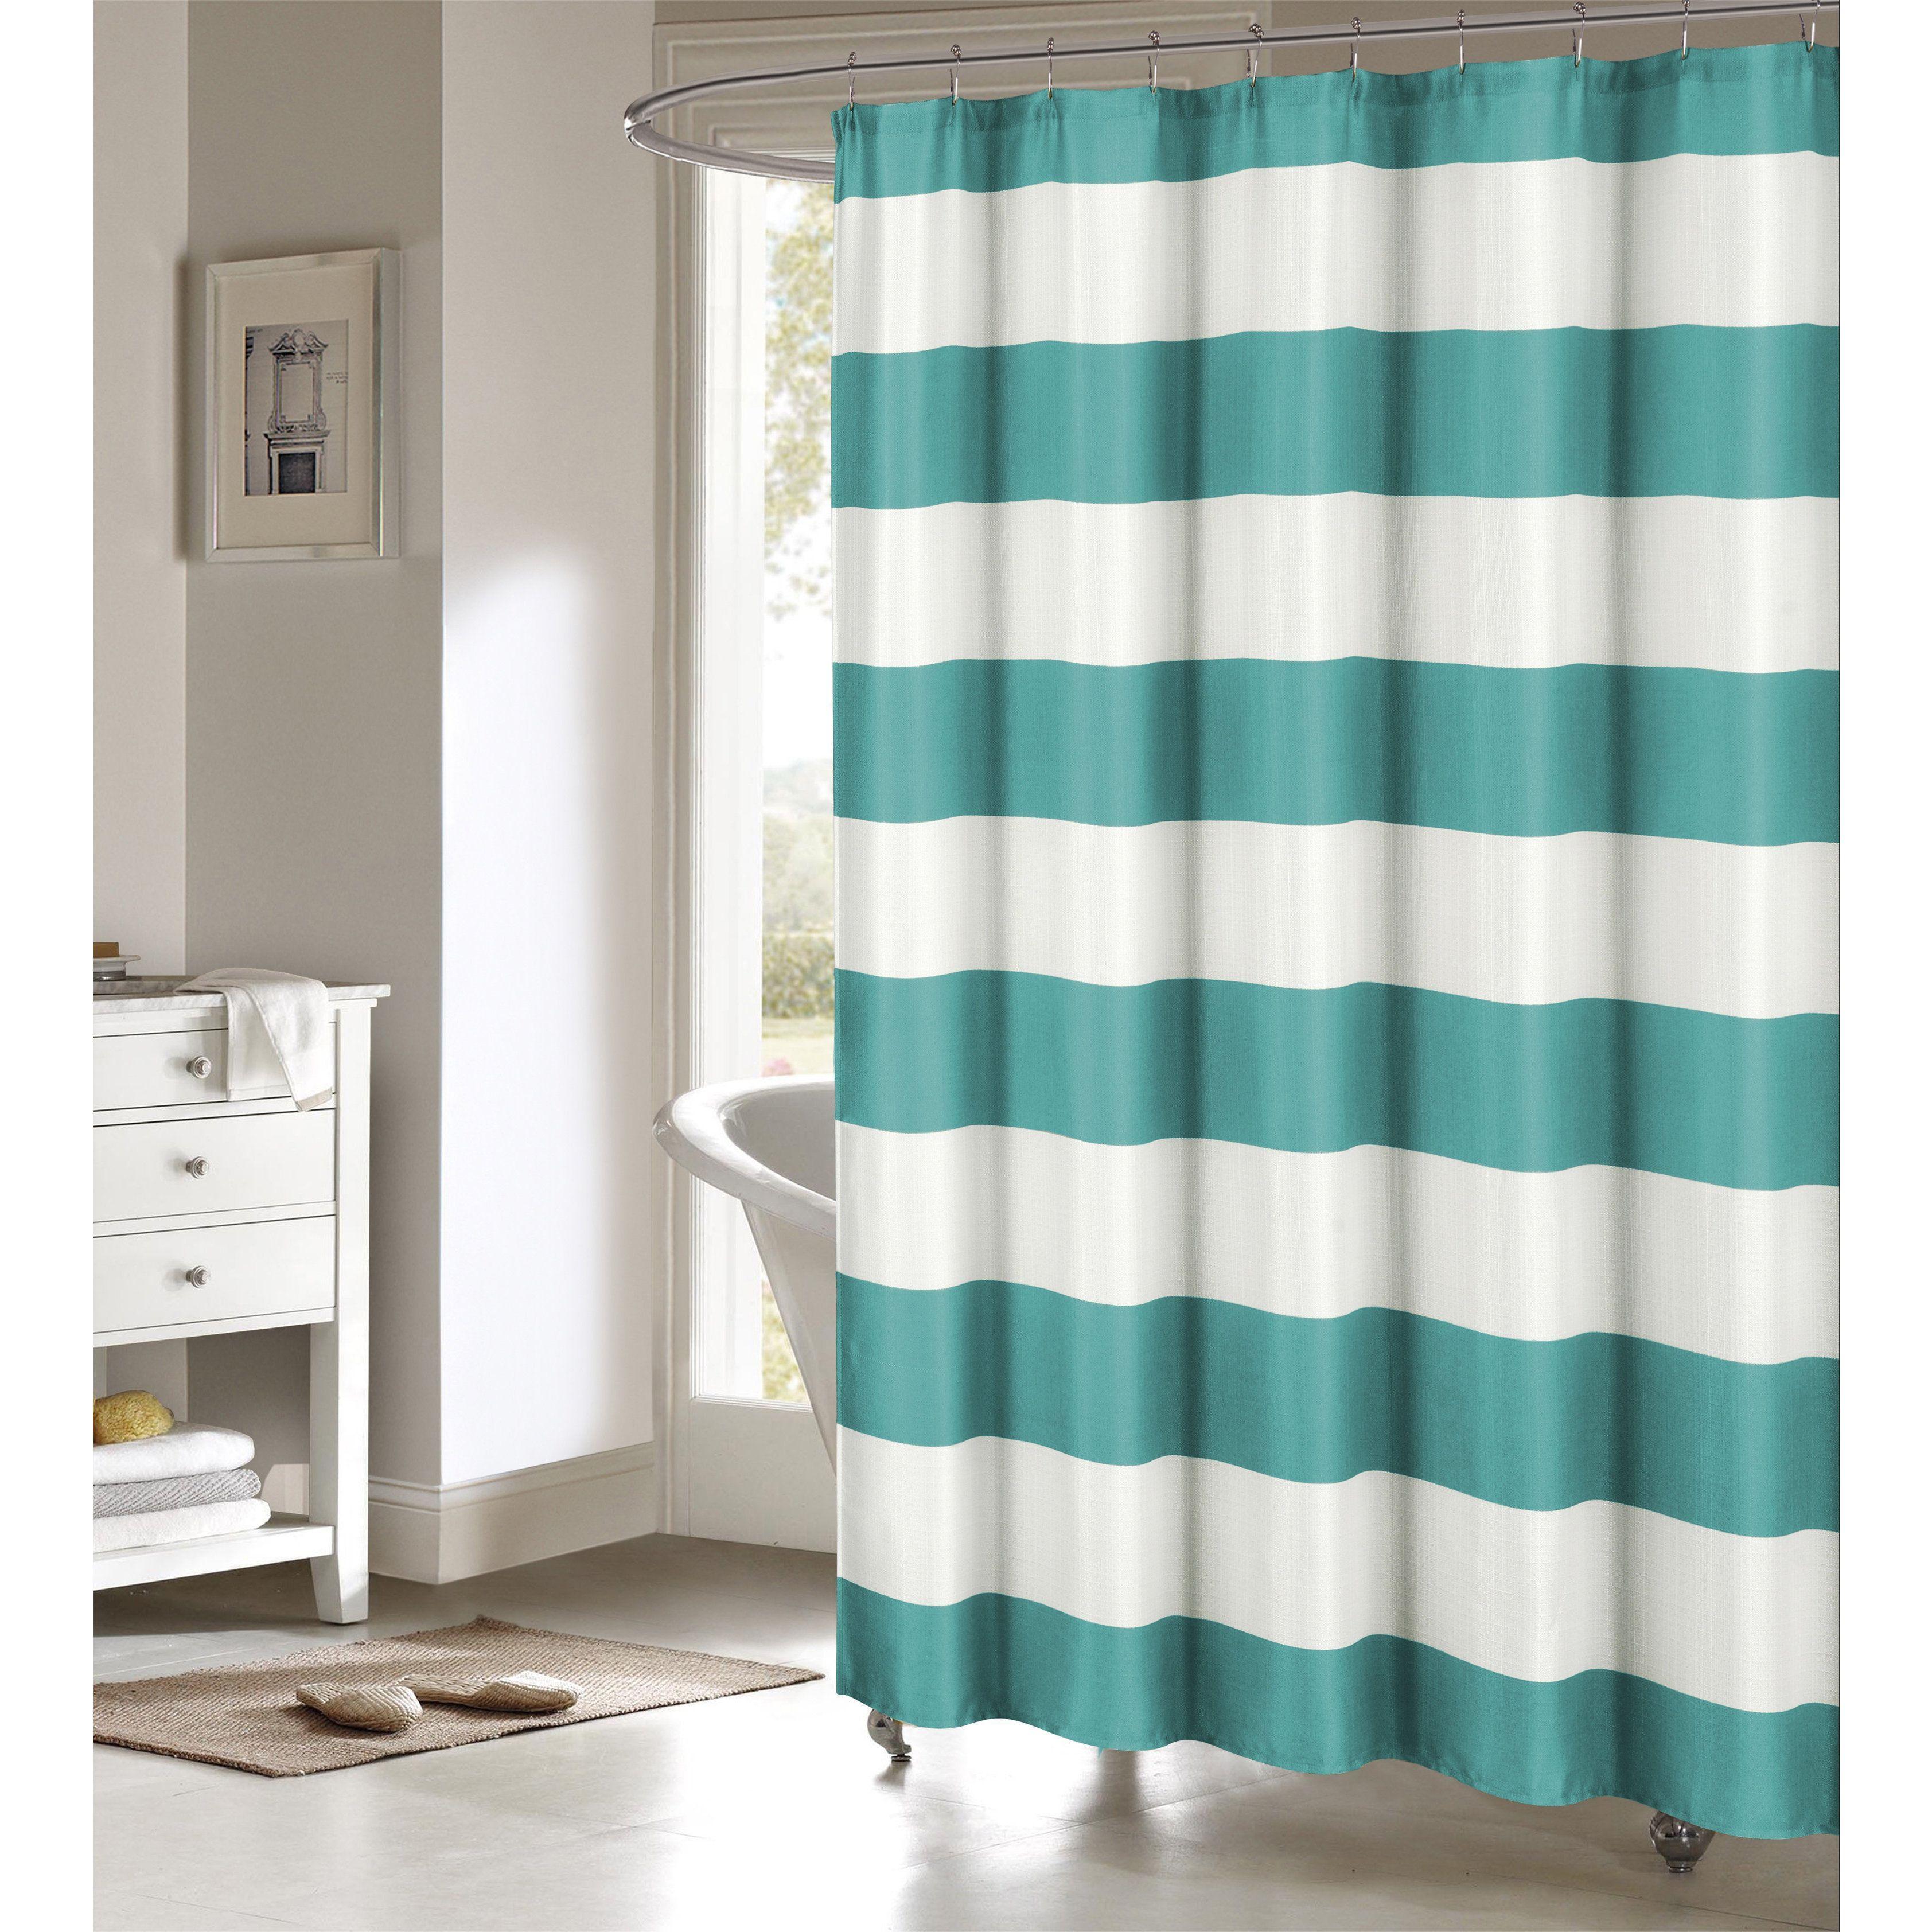 Duck River Toto Faux Linen Shower Curtain | Products | Pinterest ...